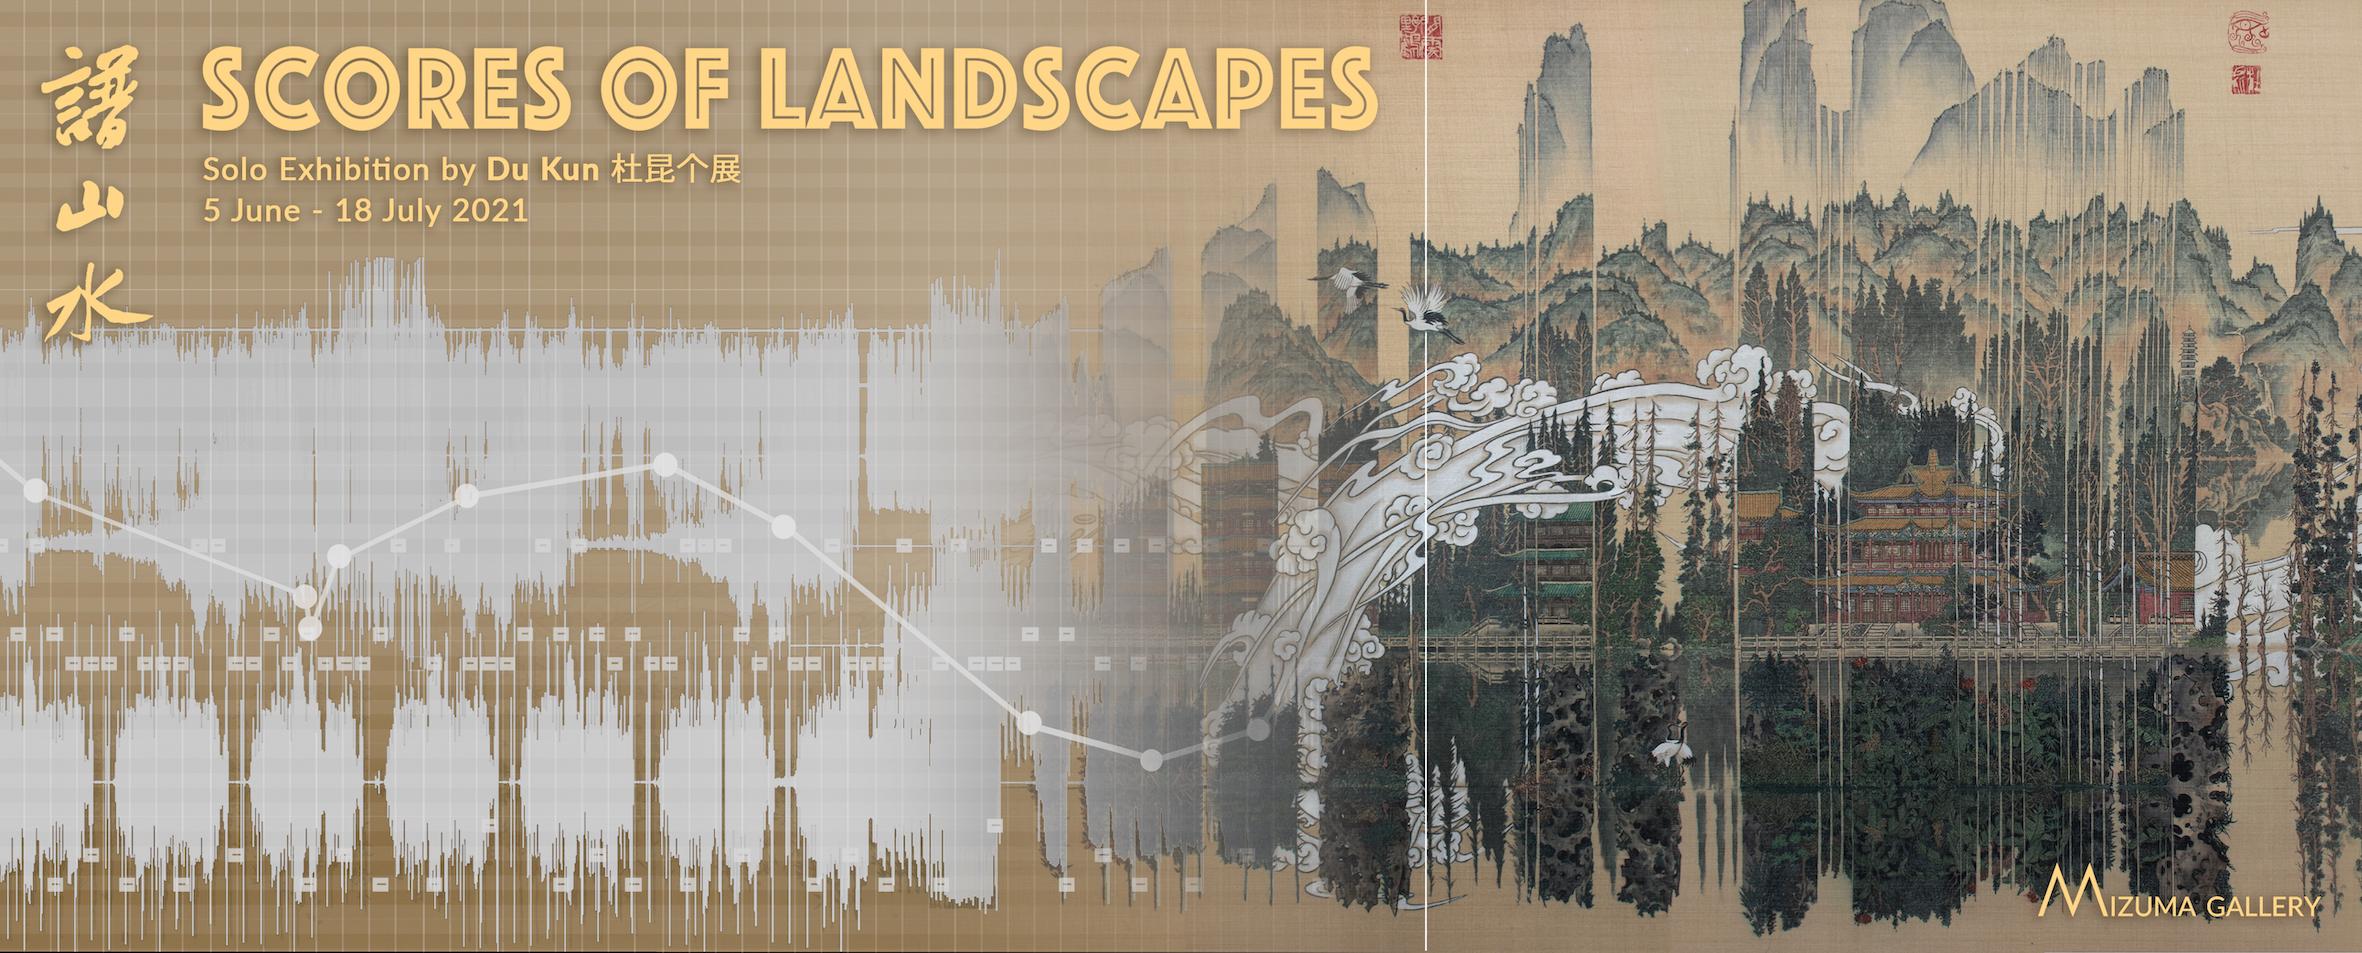 Scores of Landscapes by Du Kun